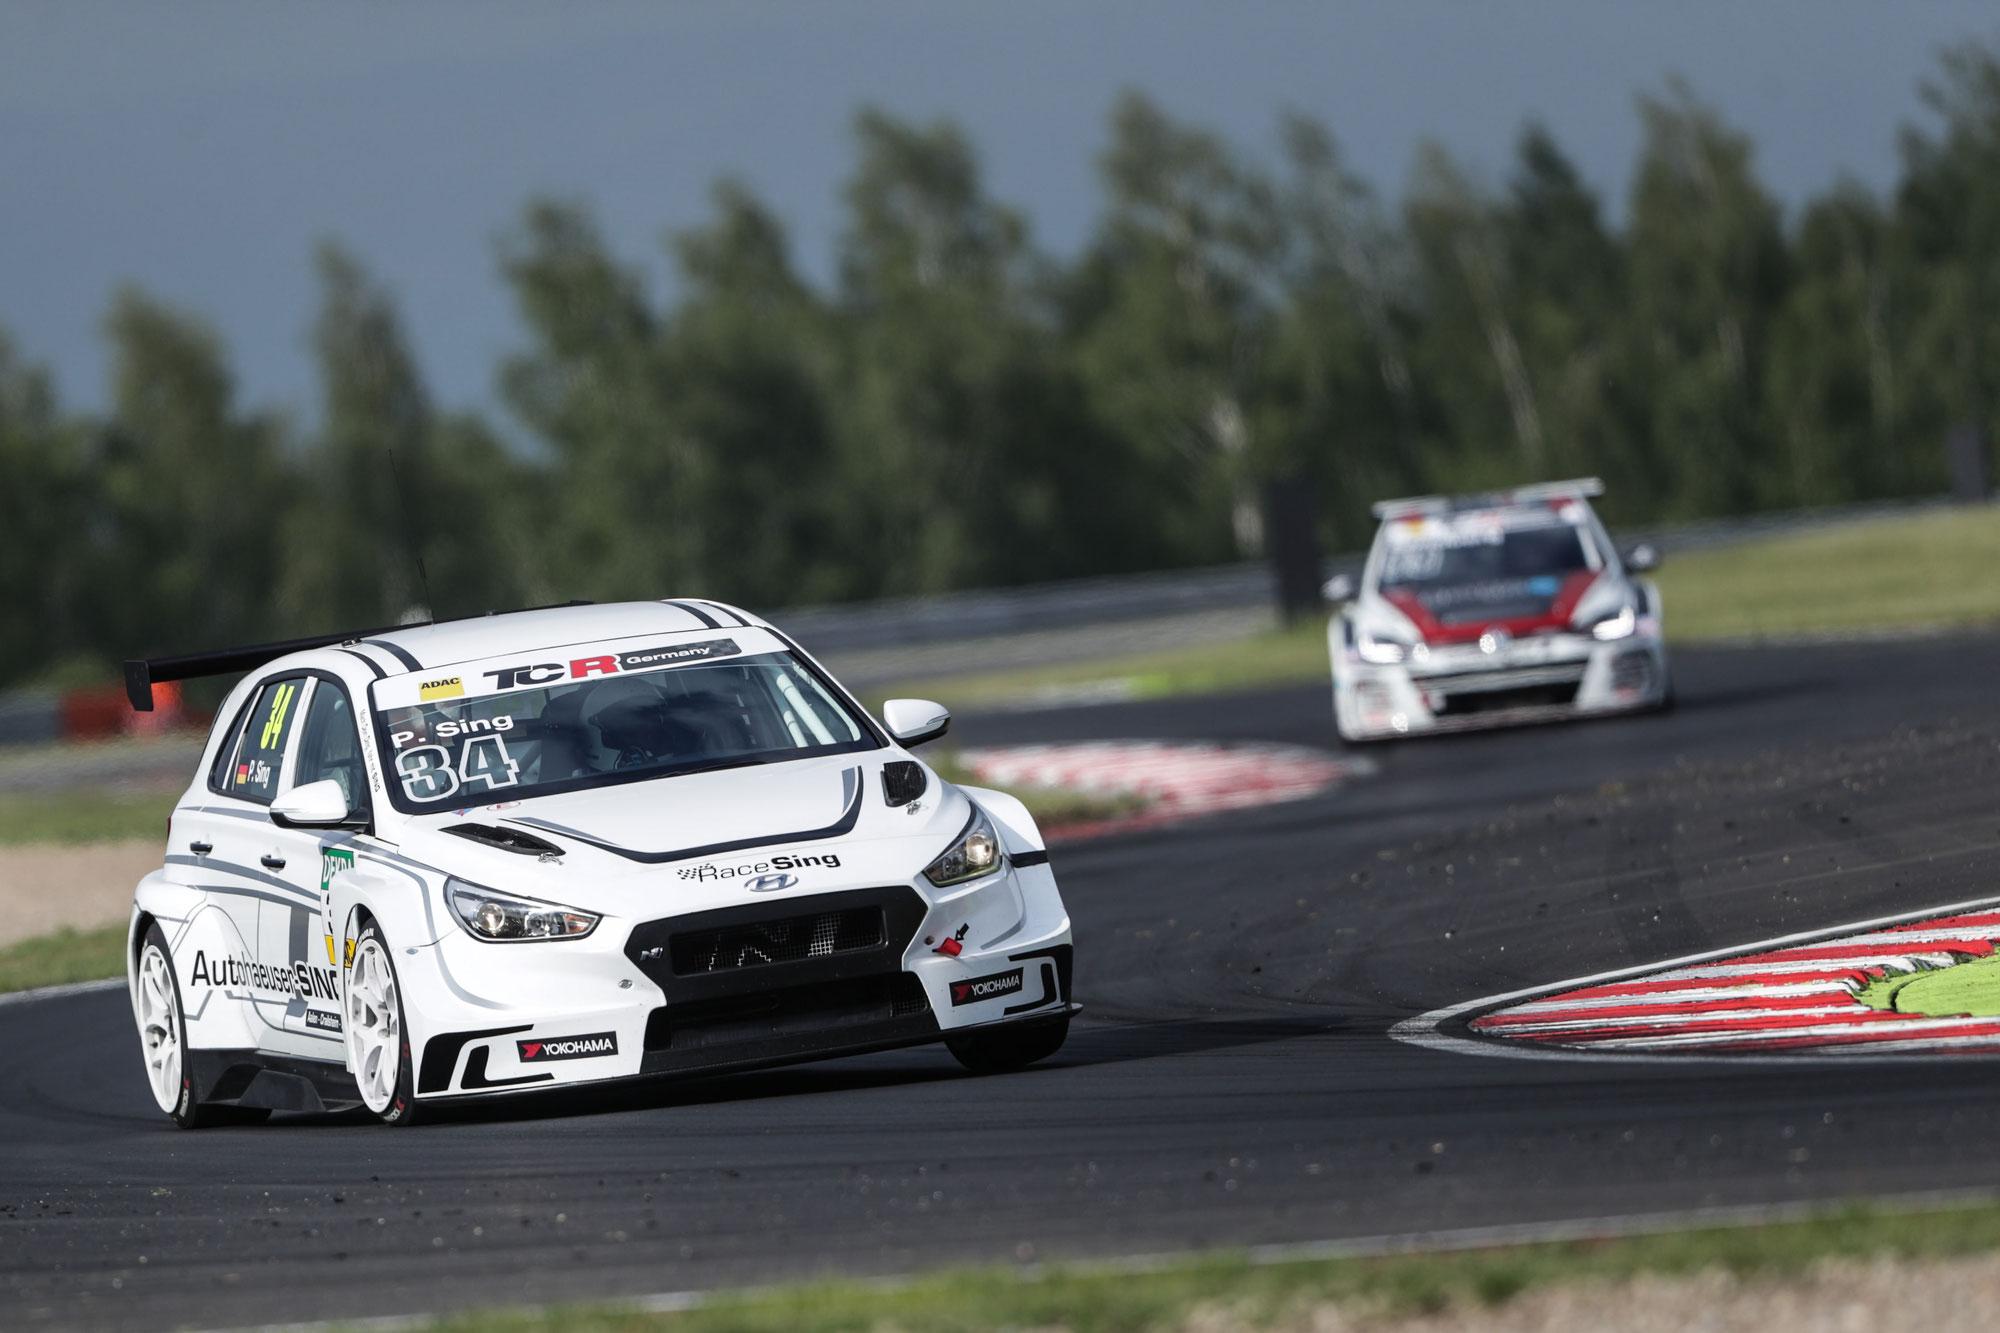 Patrick Sing startet im Hyundai i30 N TCR in der ADAC TCR Germany